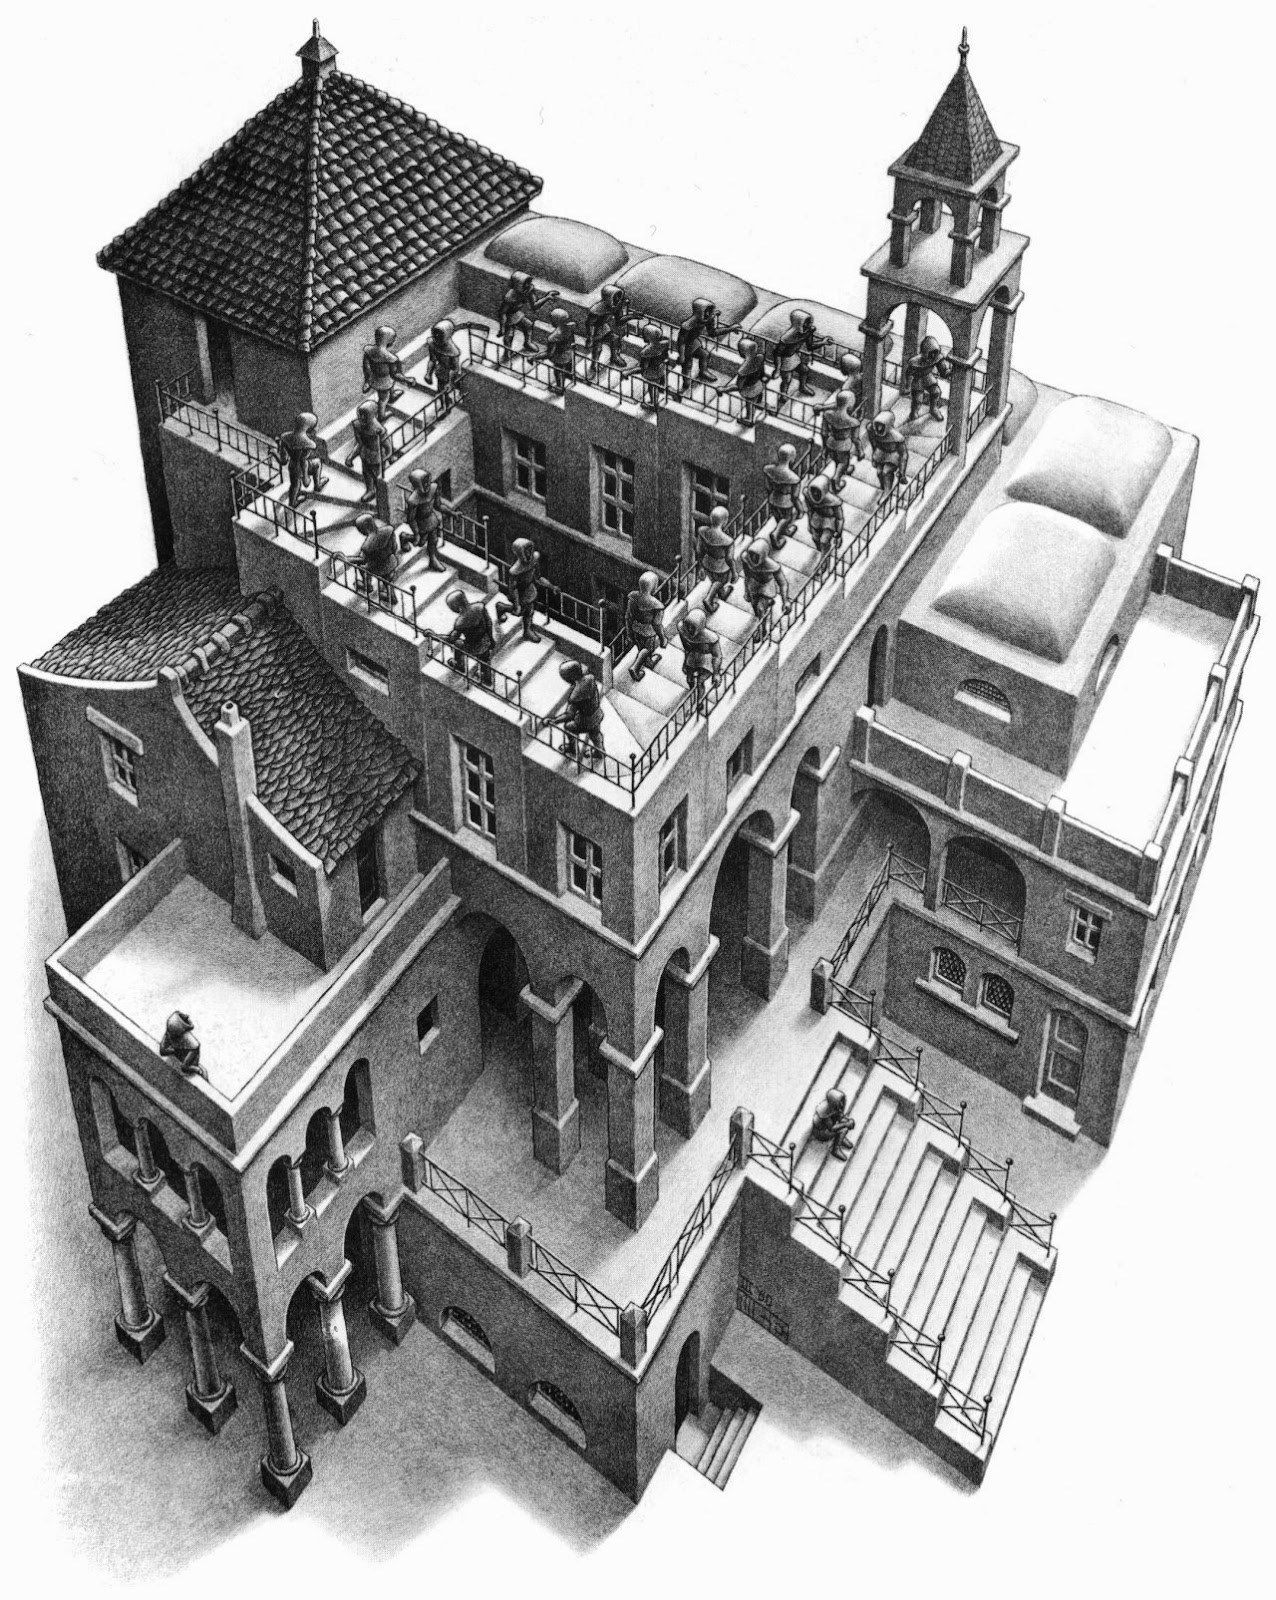 M.C. Escher, Ascending and Descending (1960)